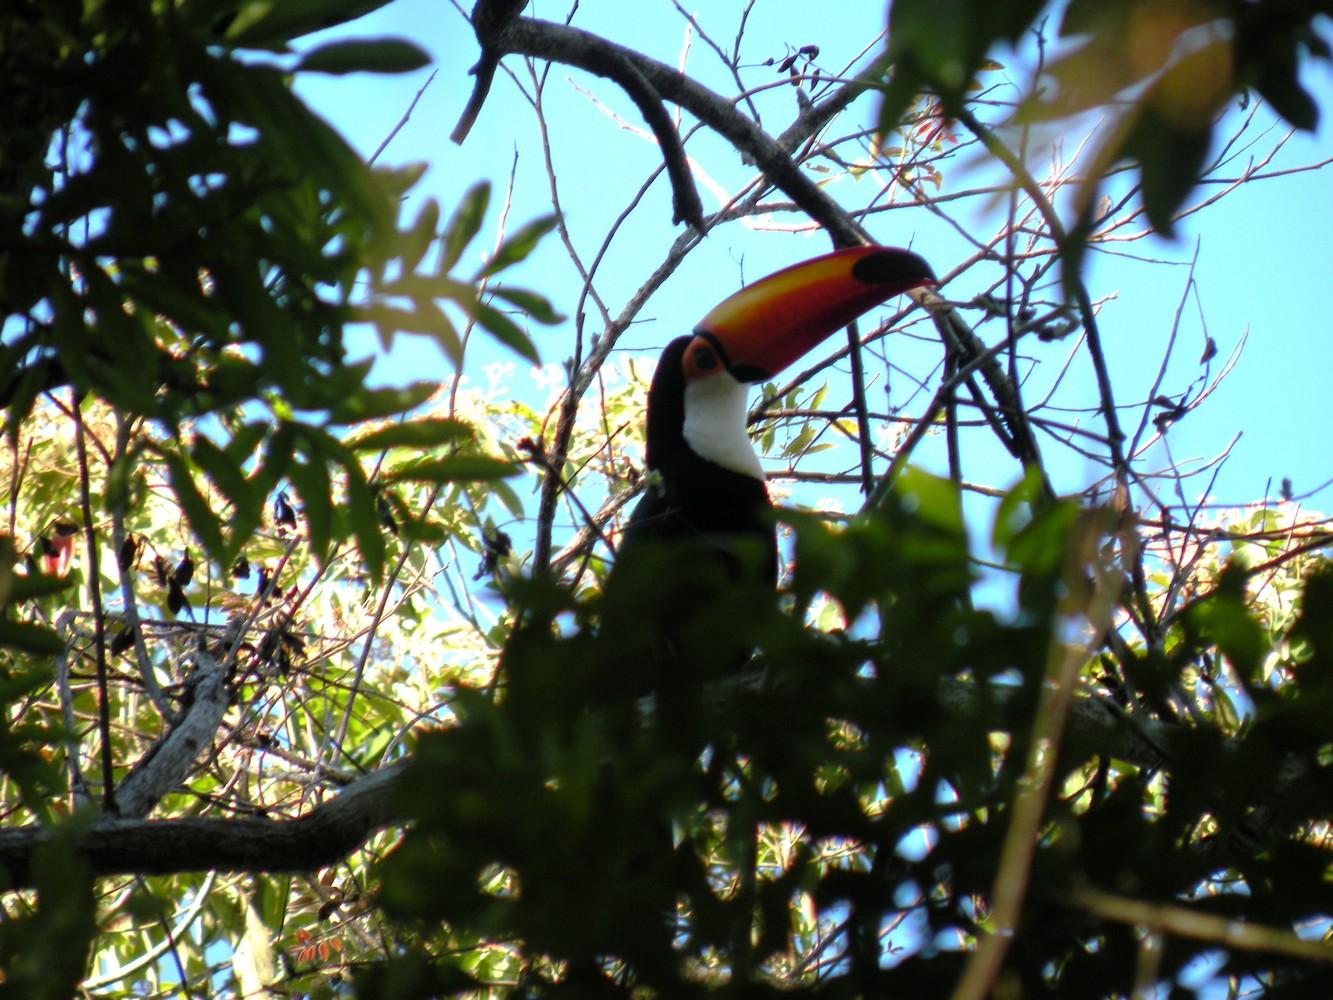 Toucan - Parque Nacional Iguazú